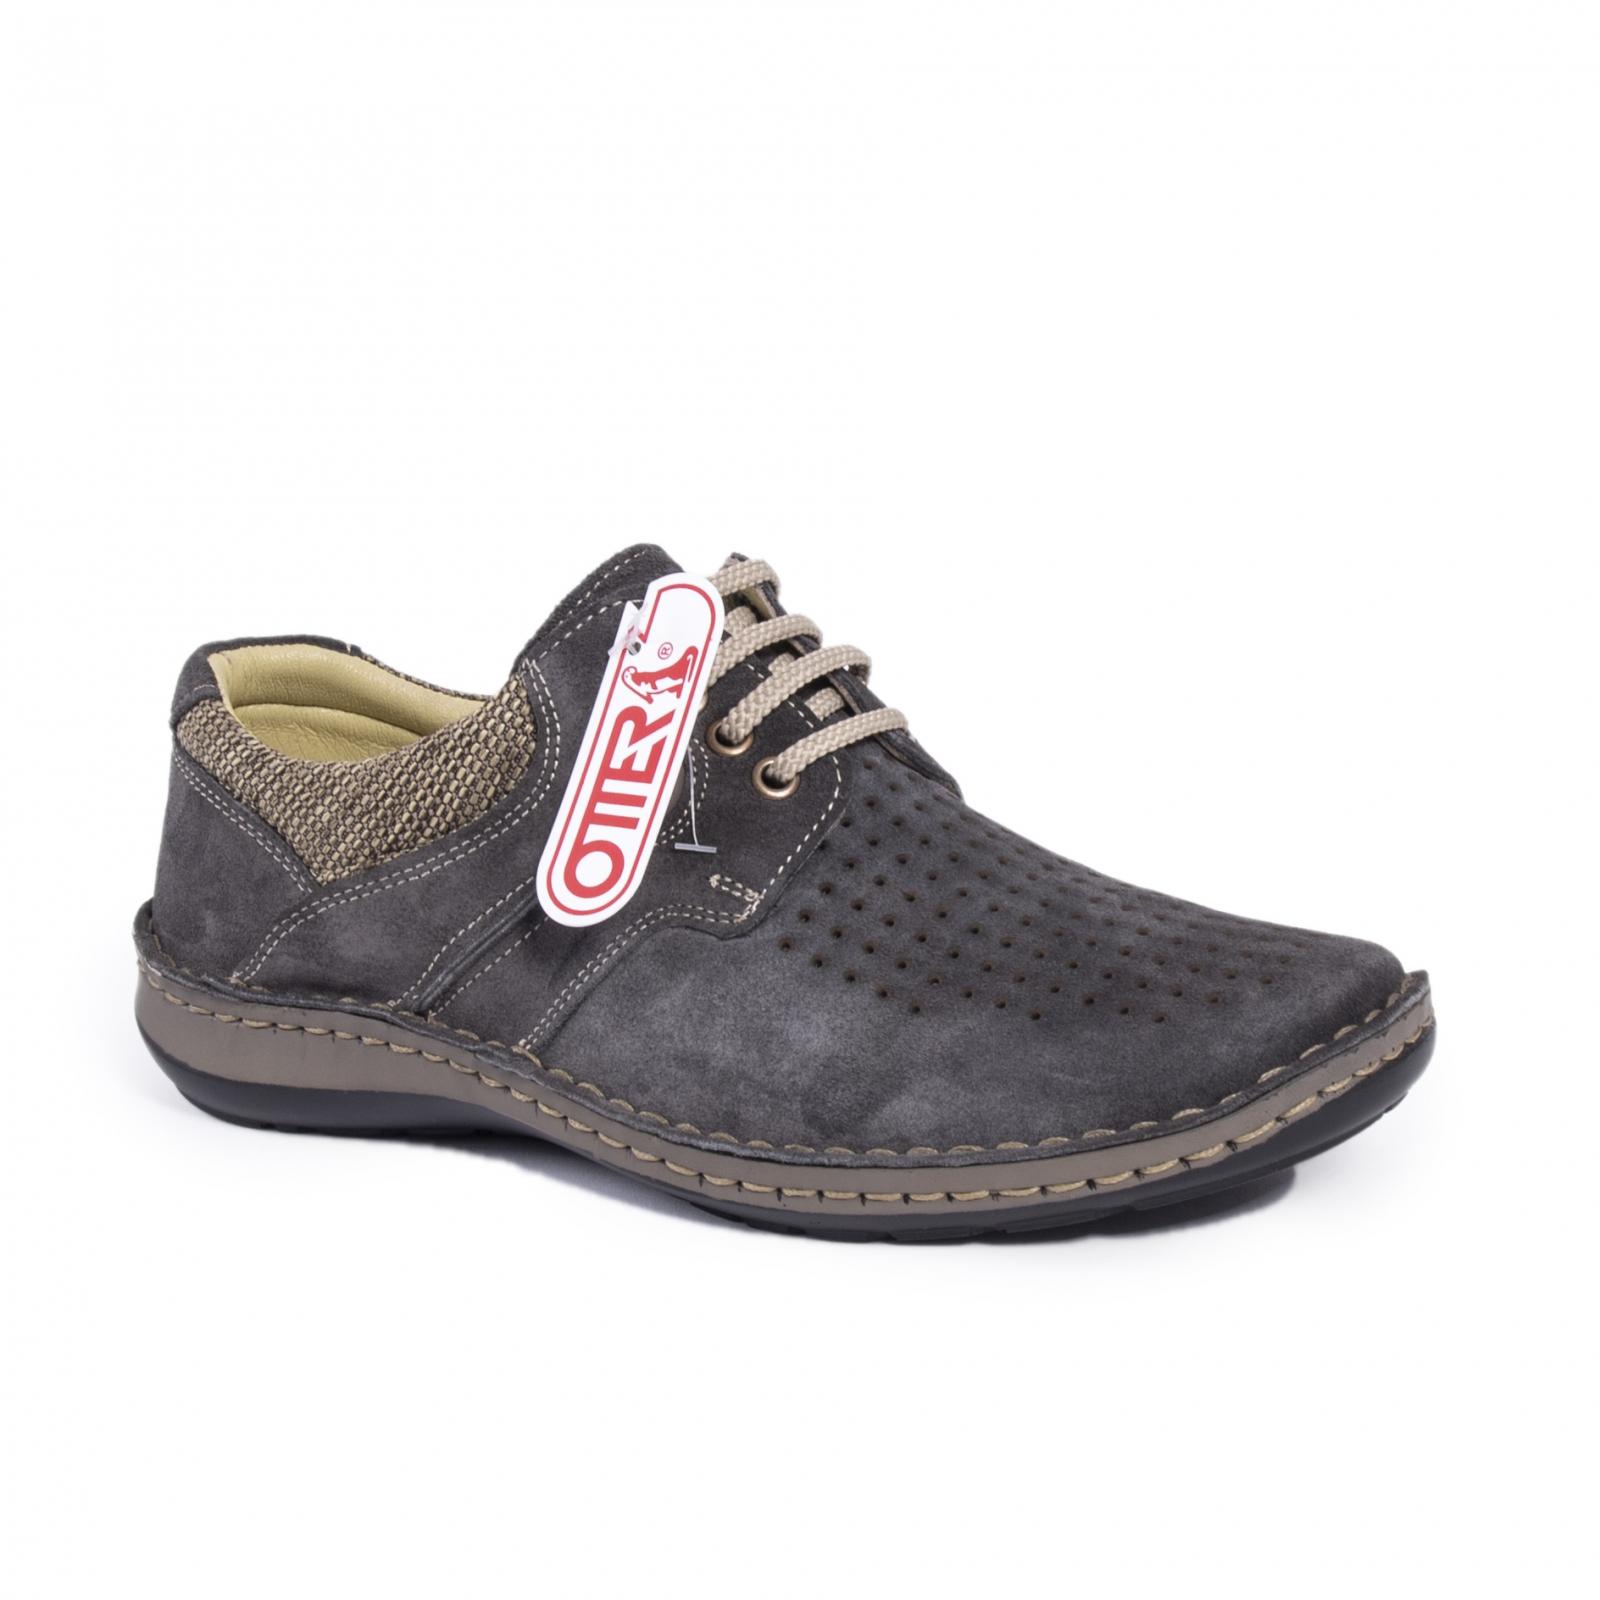 Pantofi Naturala I Vara Gri Nabuc Barbati Otter 9560 42 Inchis Piele 8nwOP0k